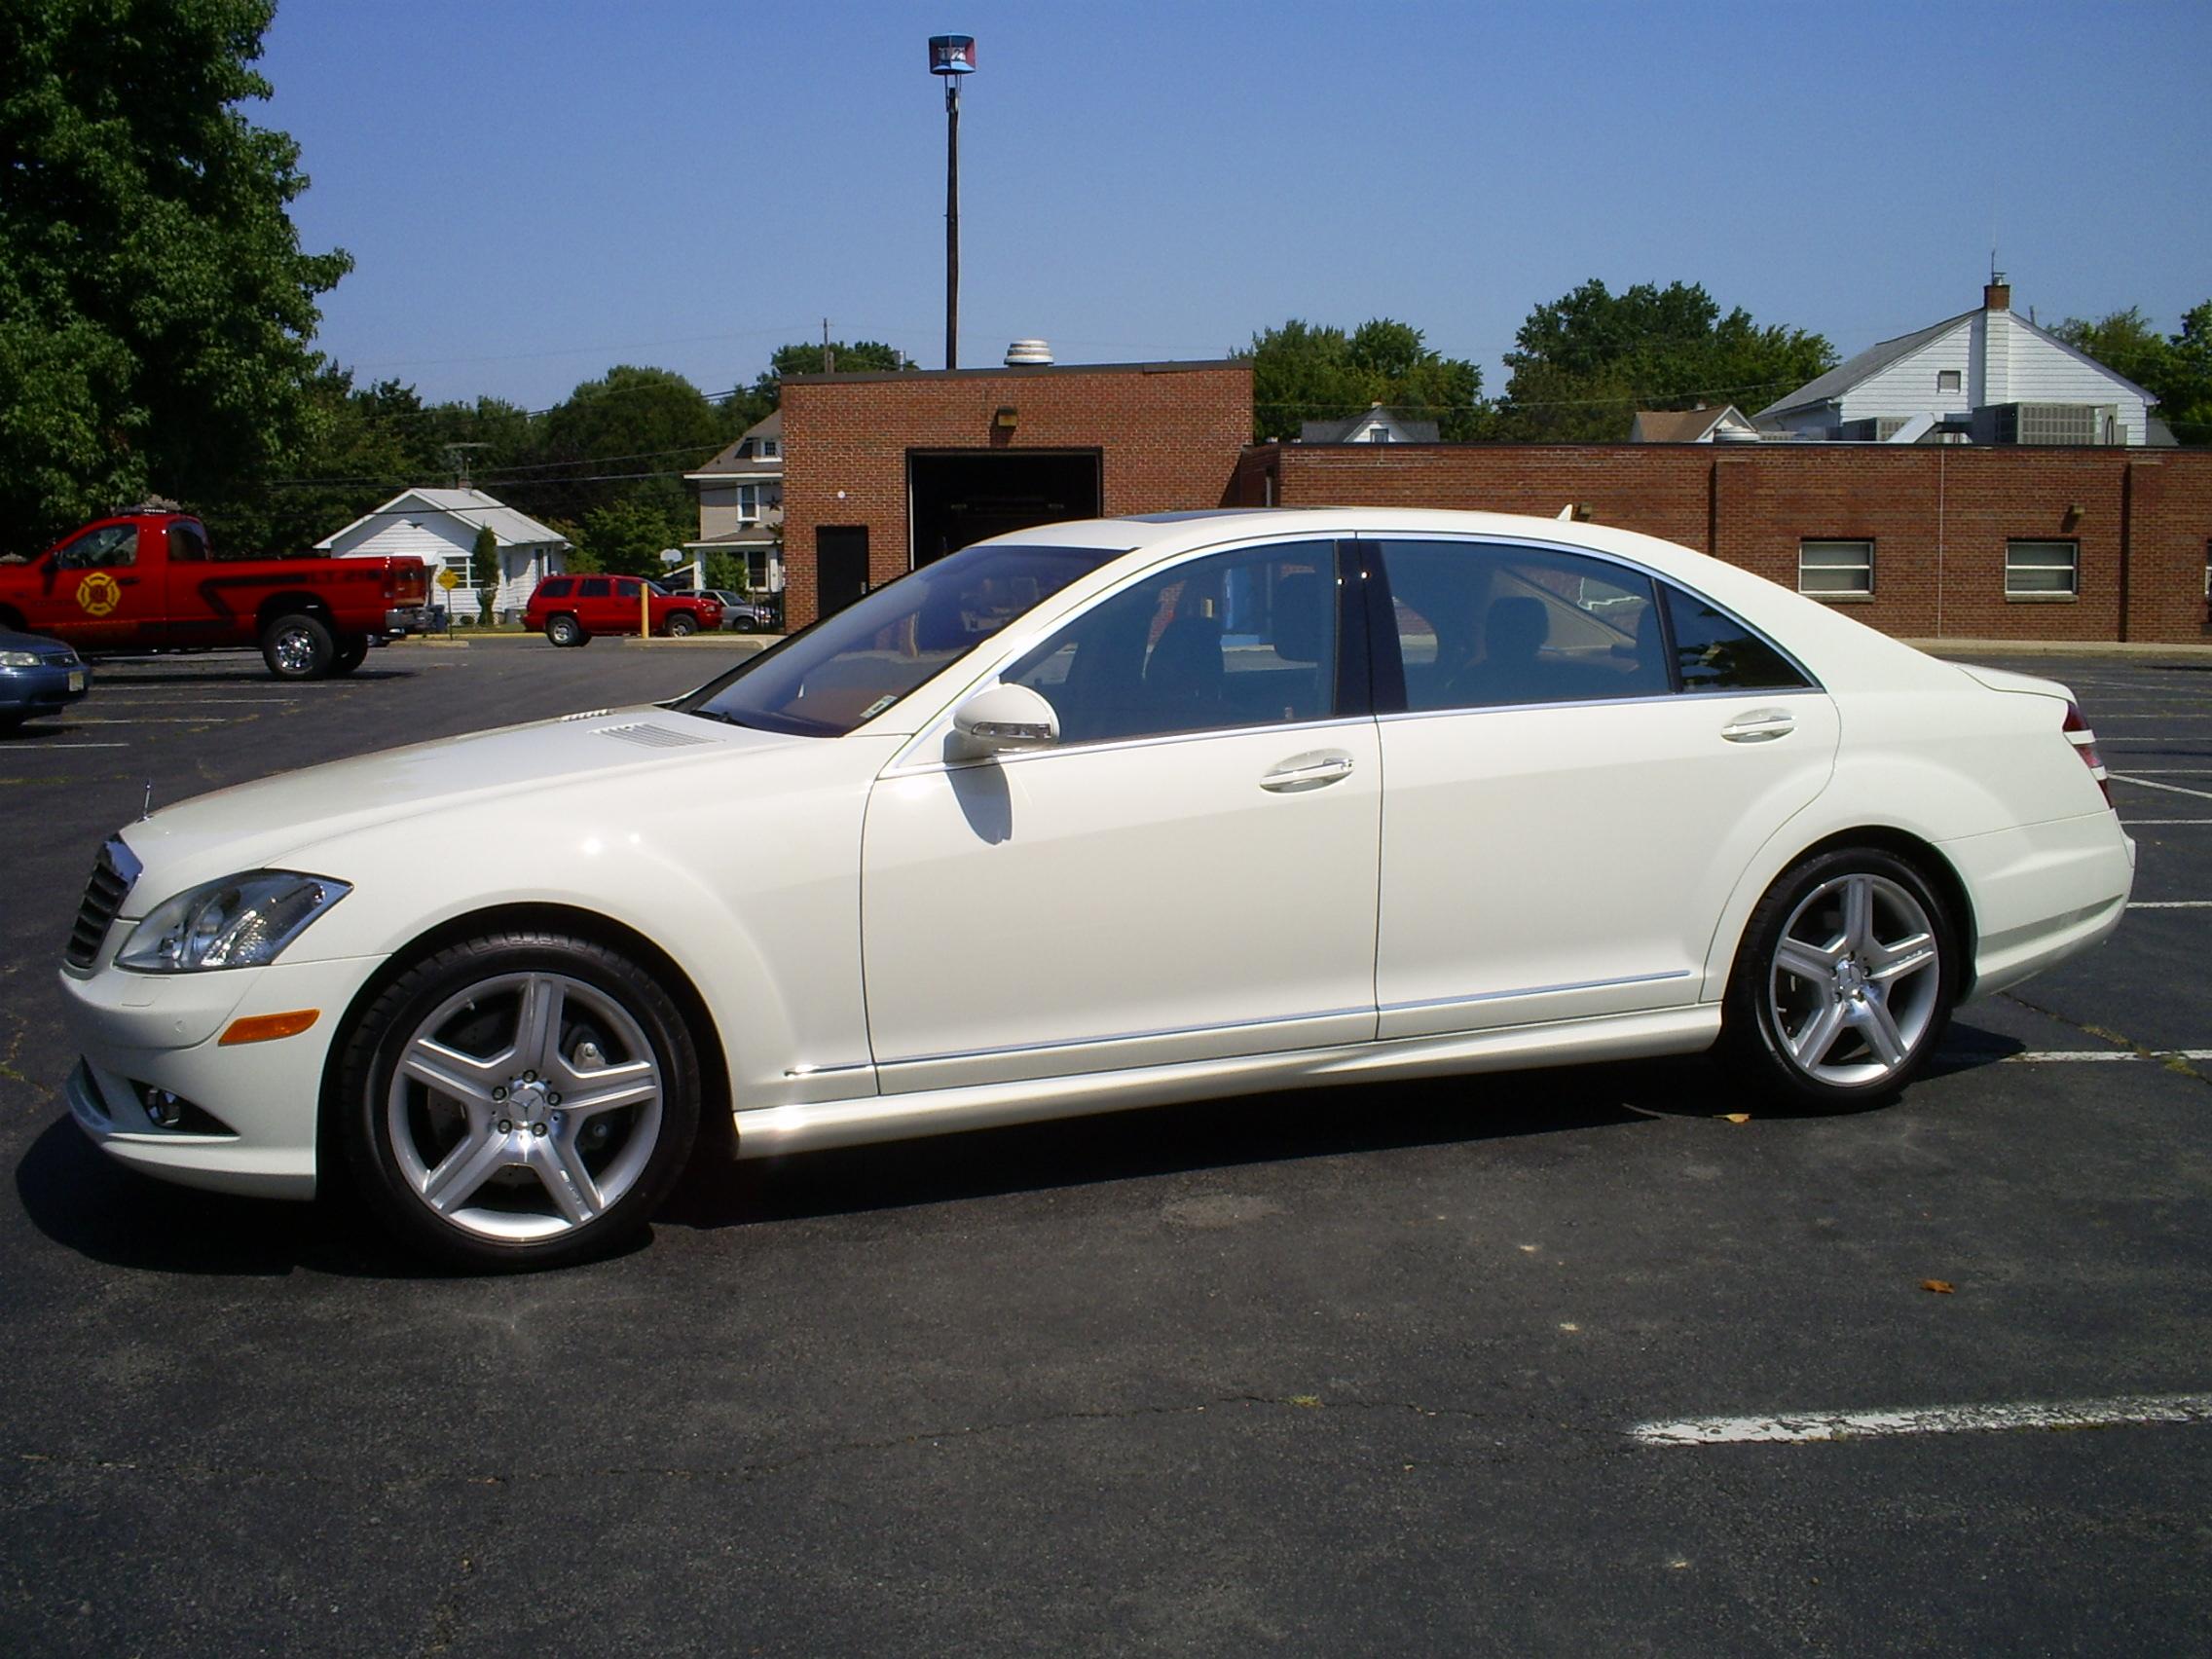 Mercedes benz s 550 photos reviews news specs buy car for S 550 mercedes benz